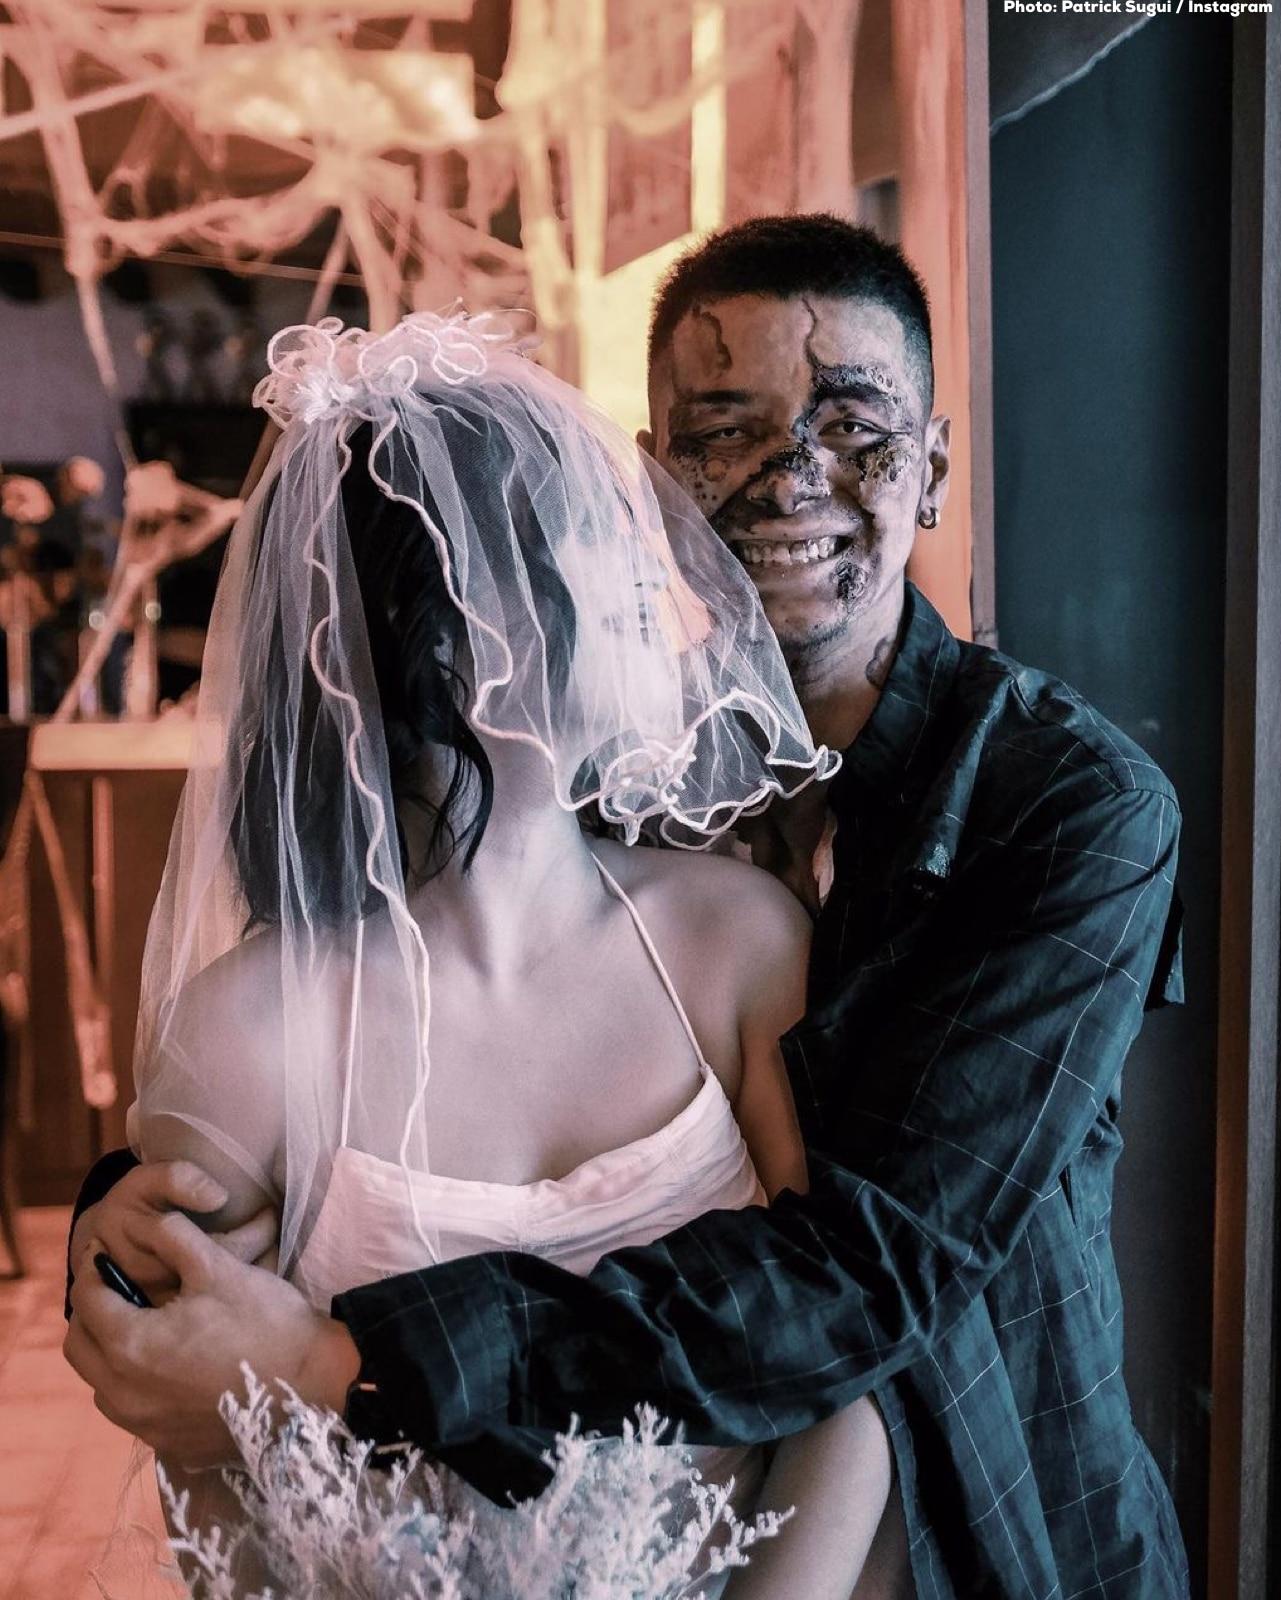 Patrick Sugui with girlfriend Aeriel Garcia